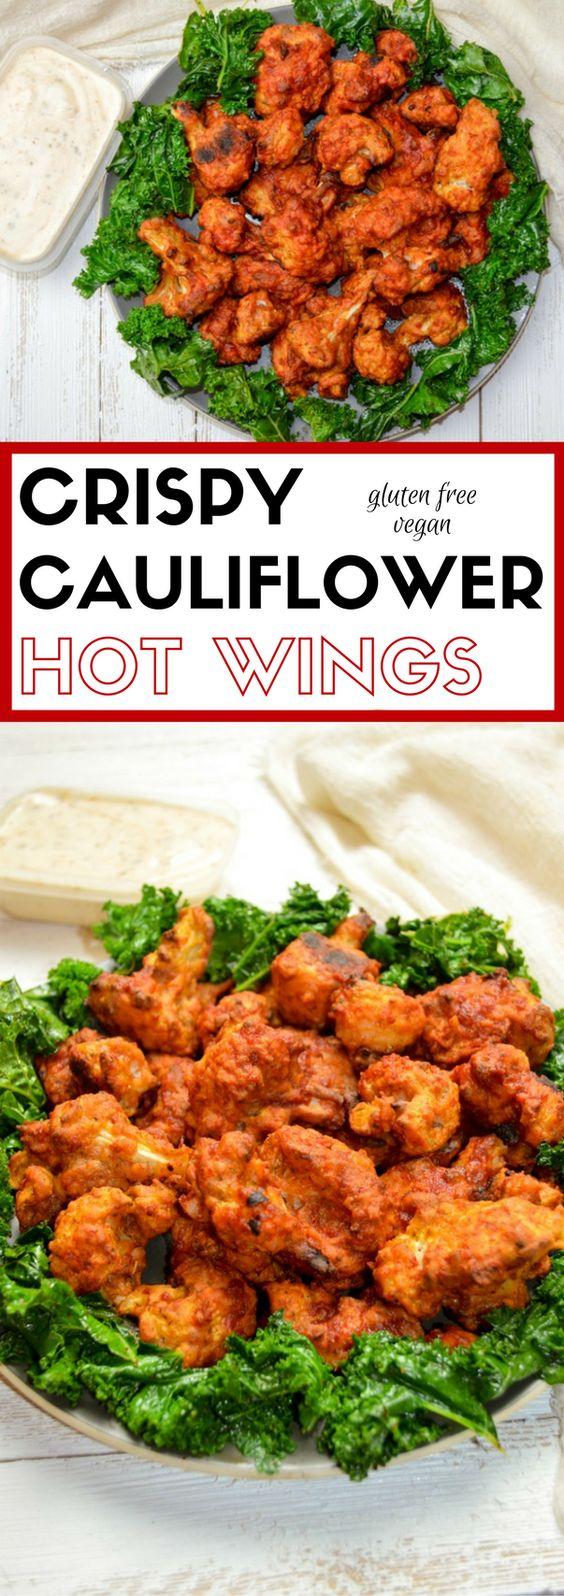 Vegan Crispy Cauliflower Hot Wings